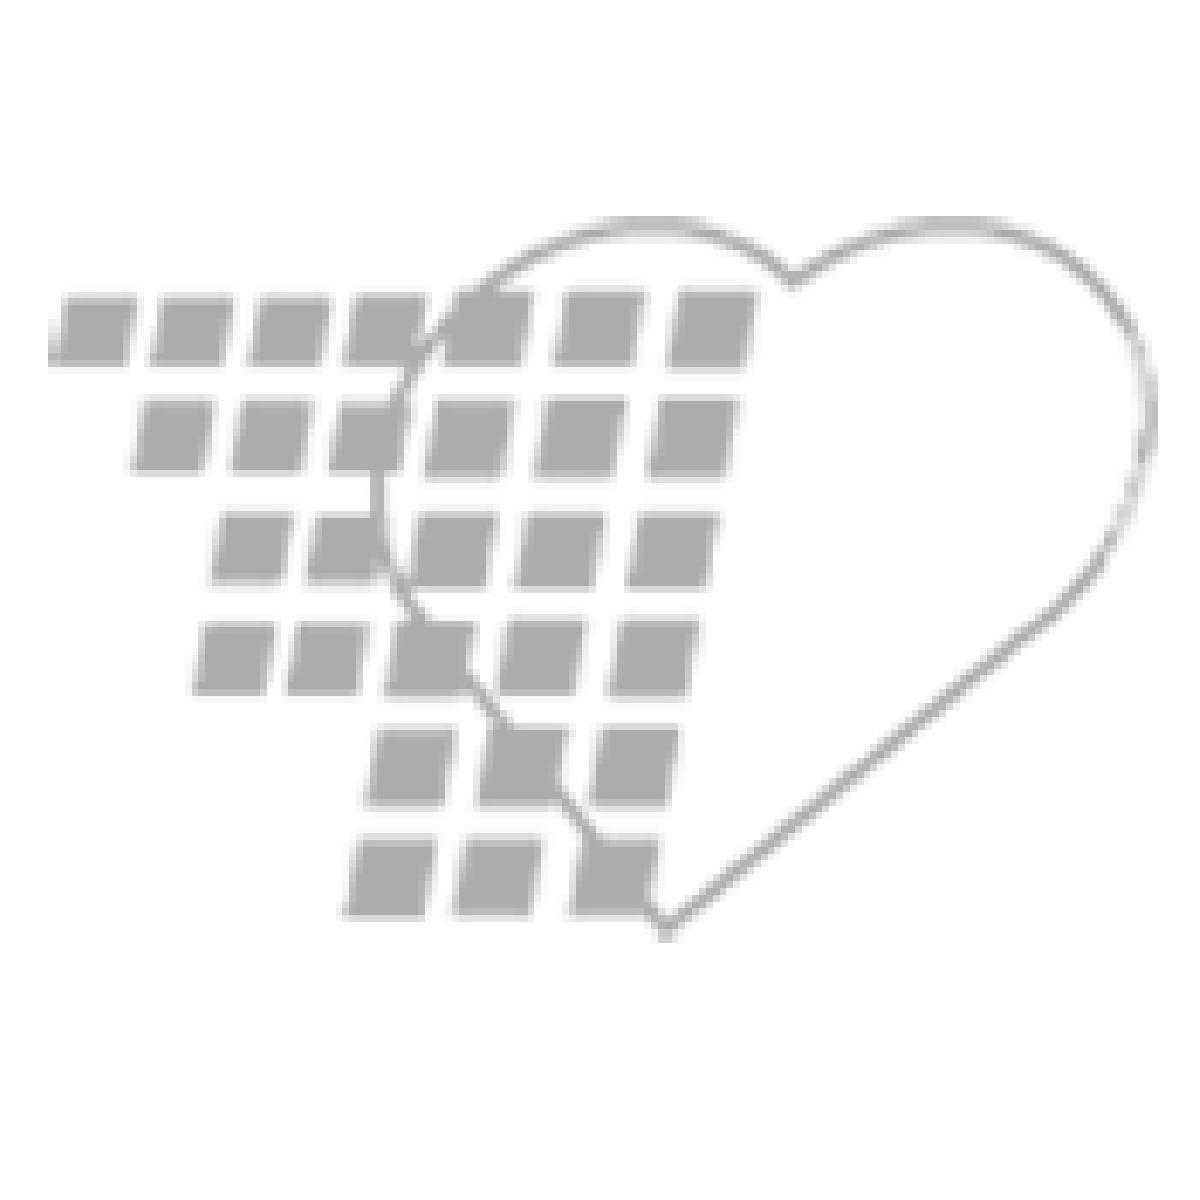 06-93-0080 Demo Dose® Hydroxyzin Paomat 25 mg - 1000 Pills/Jar